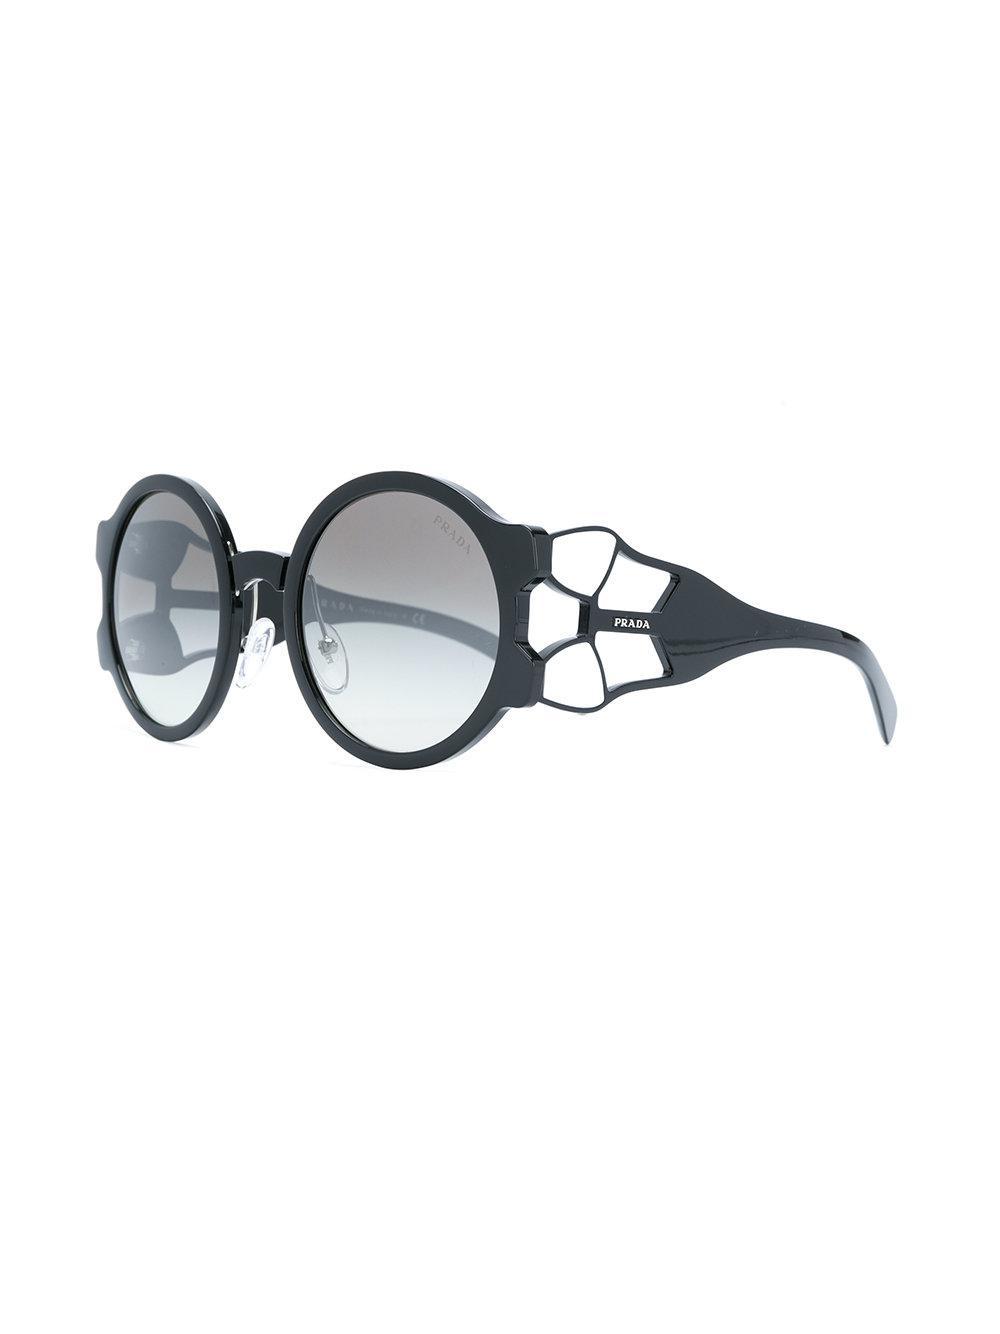 dfd6fd15b Prada Round Frame Sunglasses in Black - Save 13.765182186234824% - Lyst